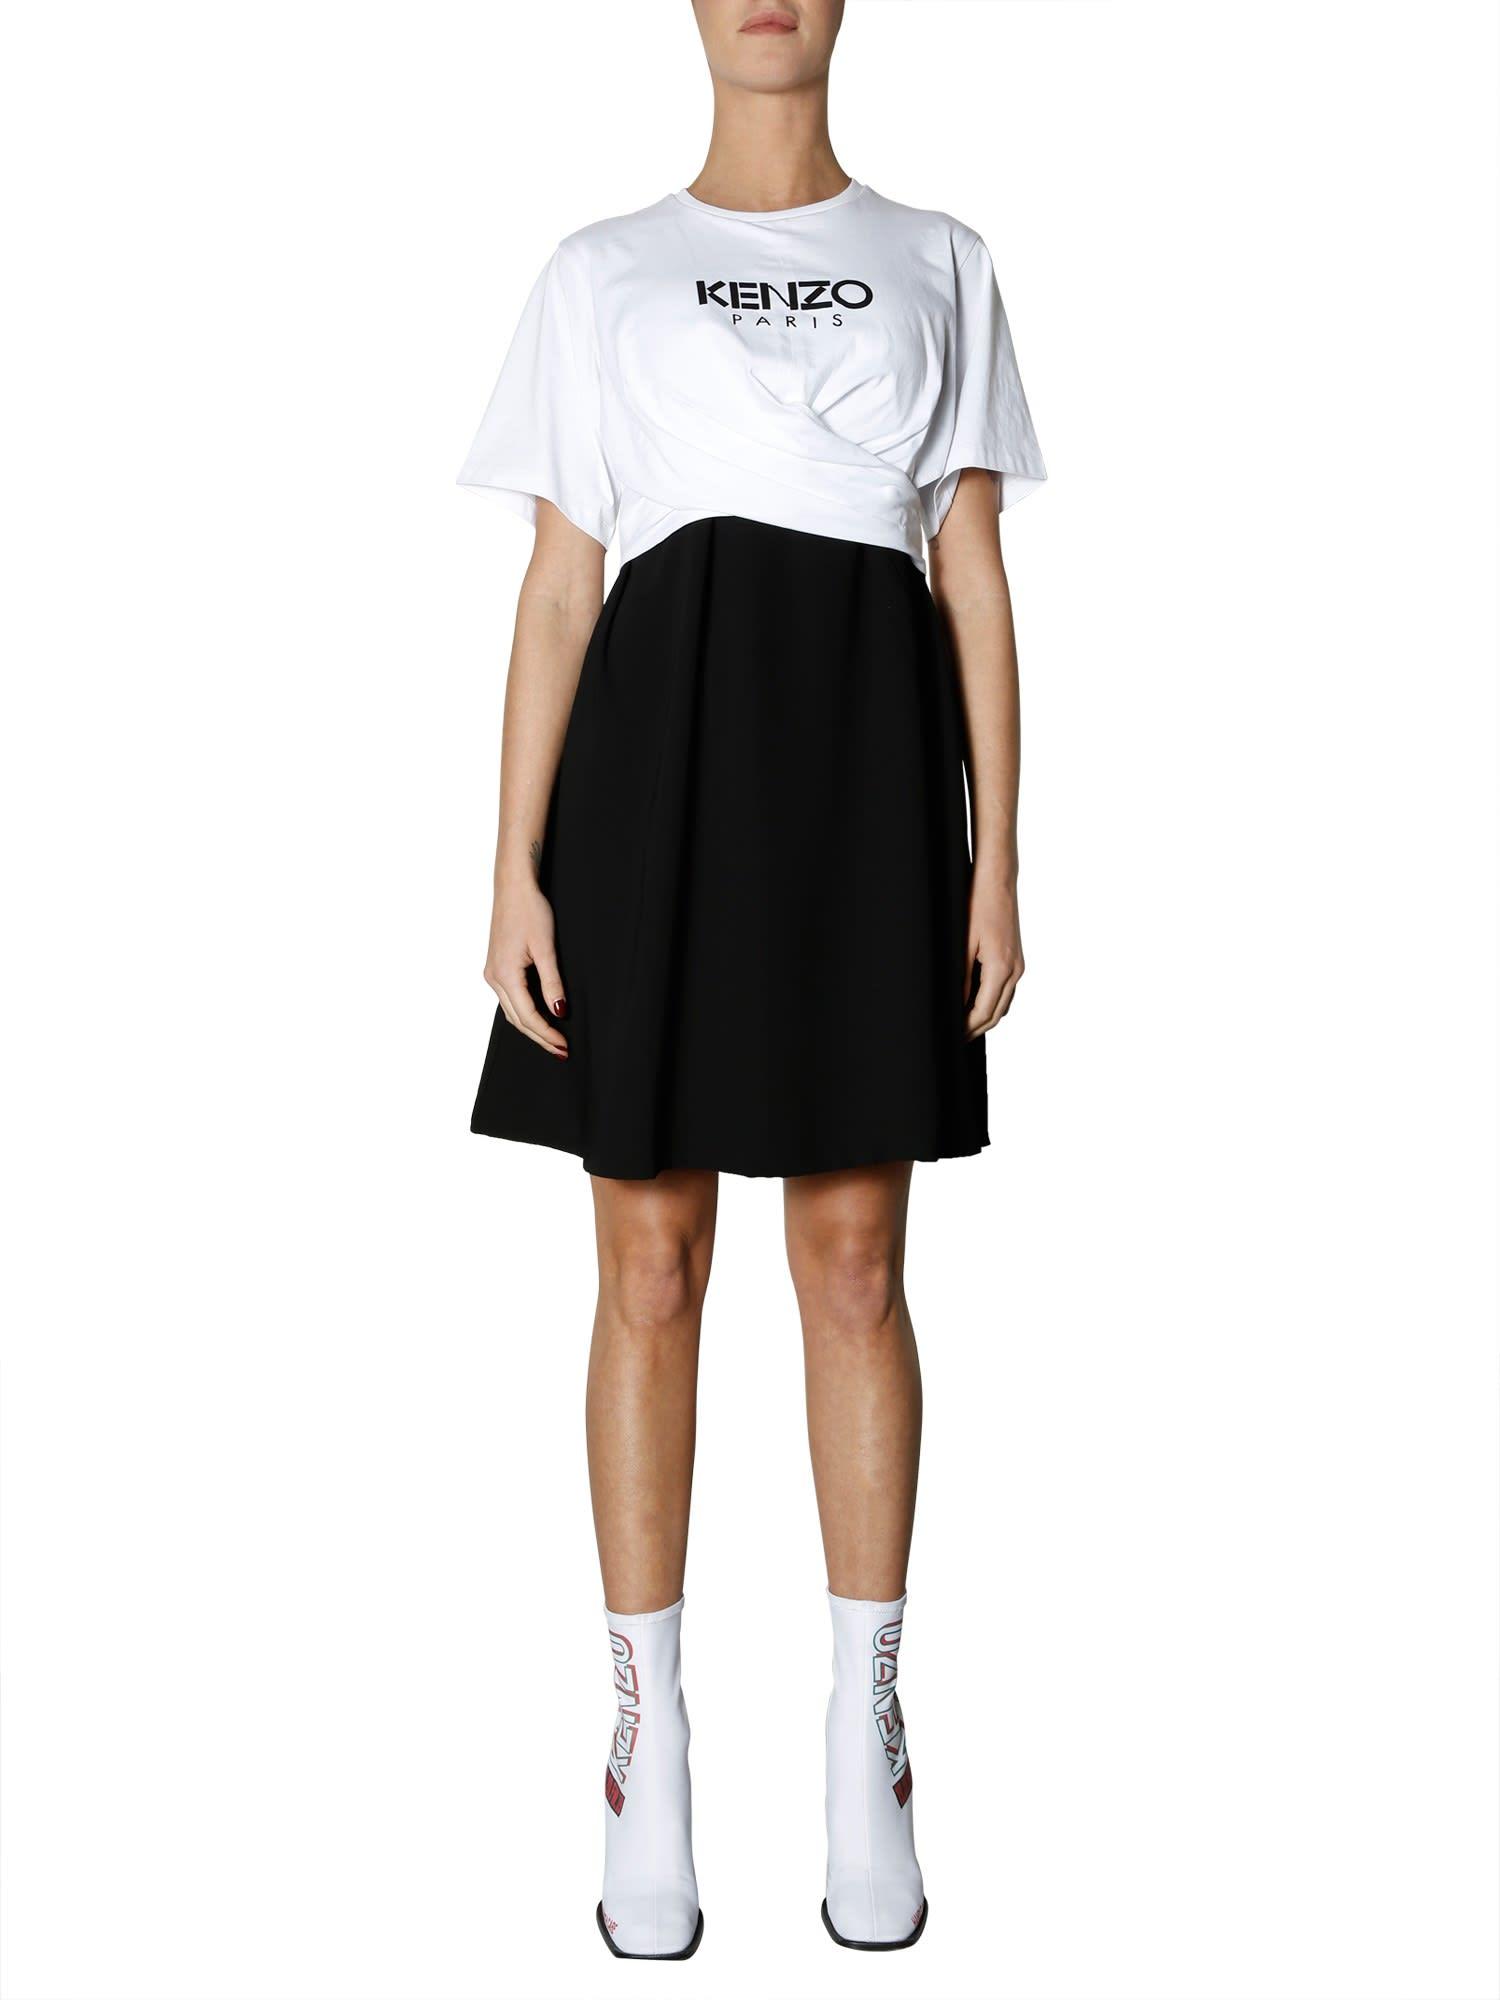 Kenzo Logo Printed Dress